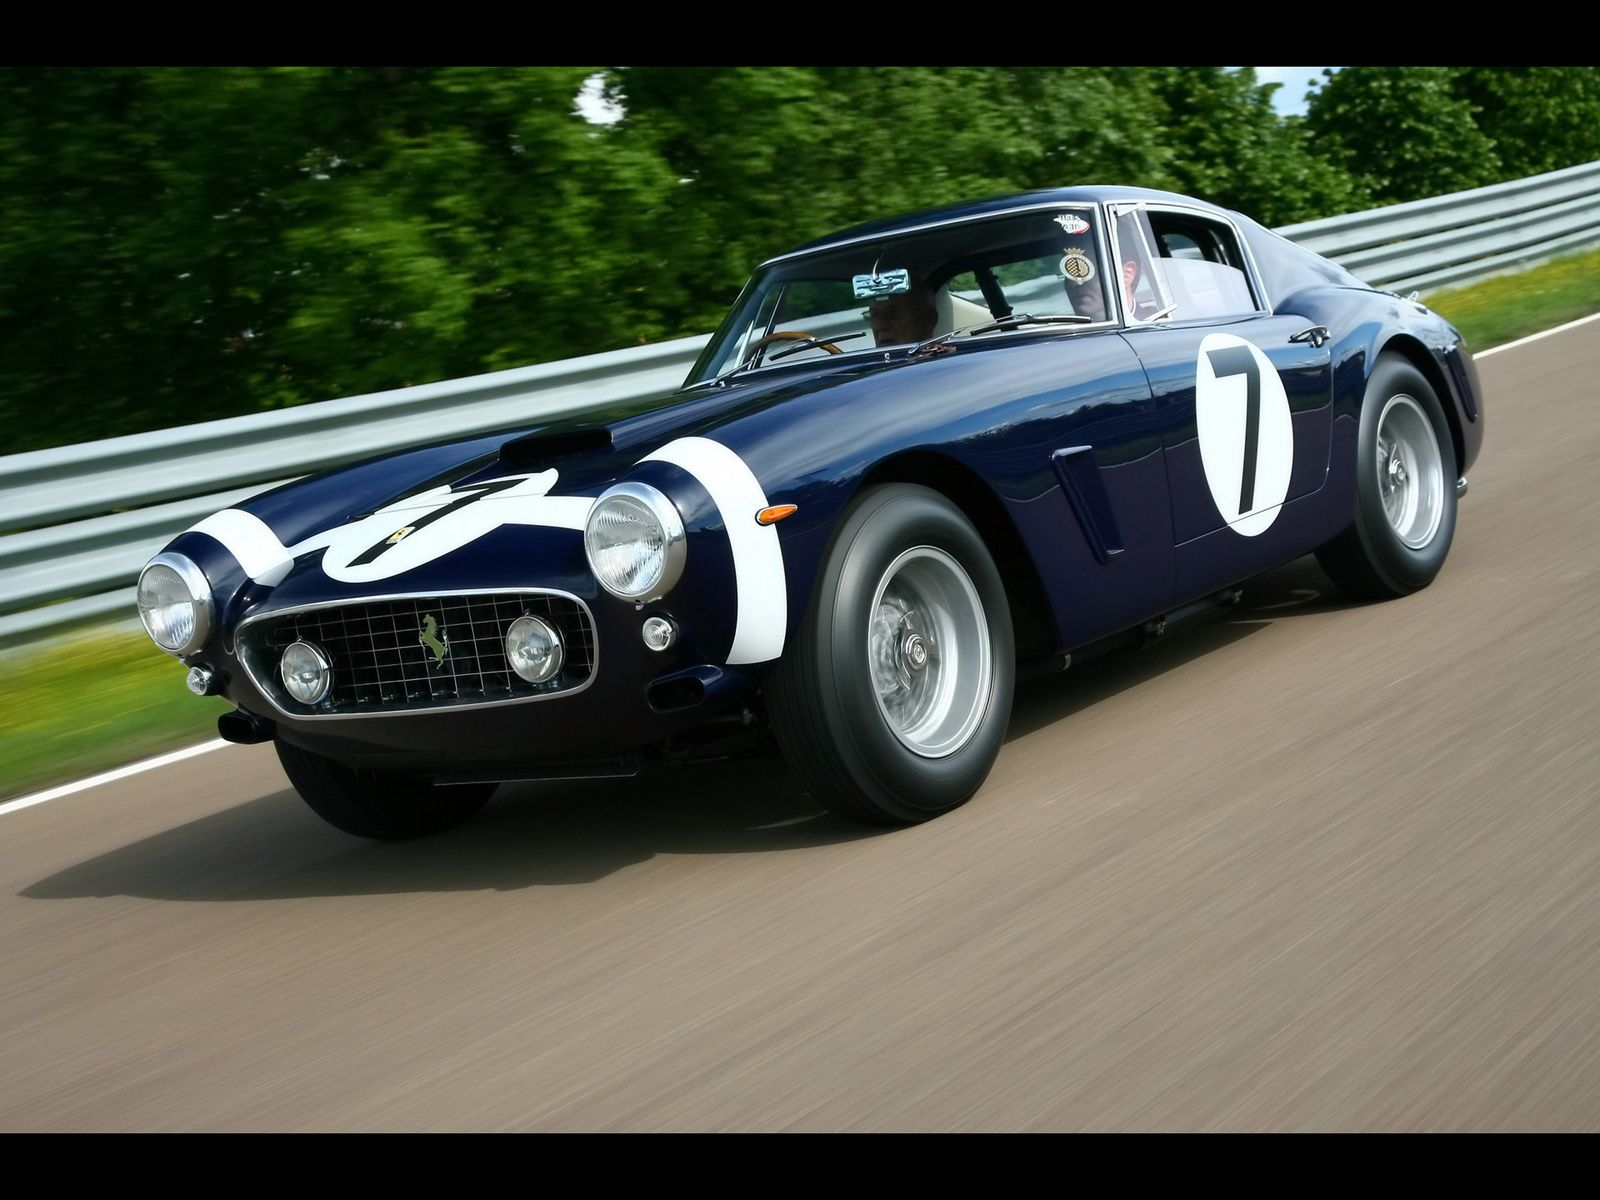 Ferrari 250 Gto I Love Dark Blue Ferraris Vintage Sports Cars